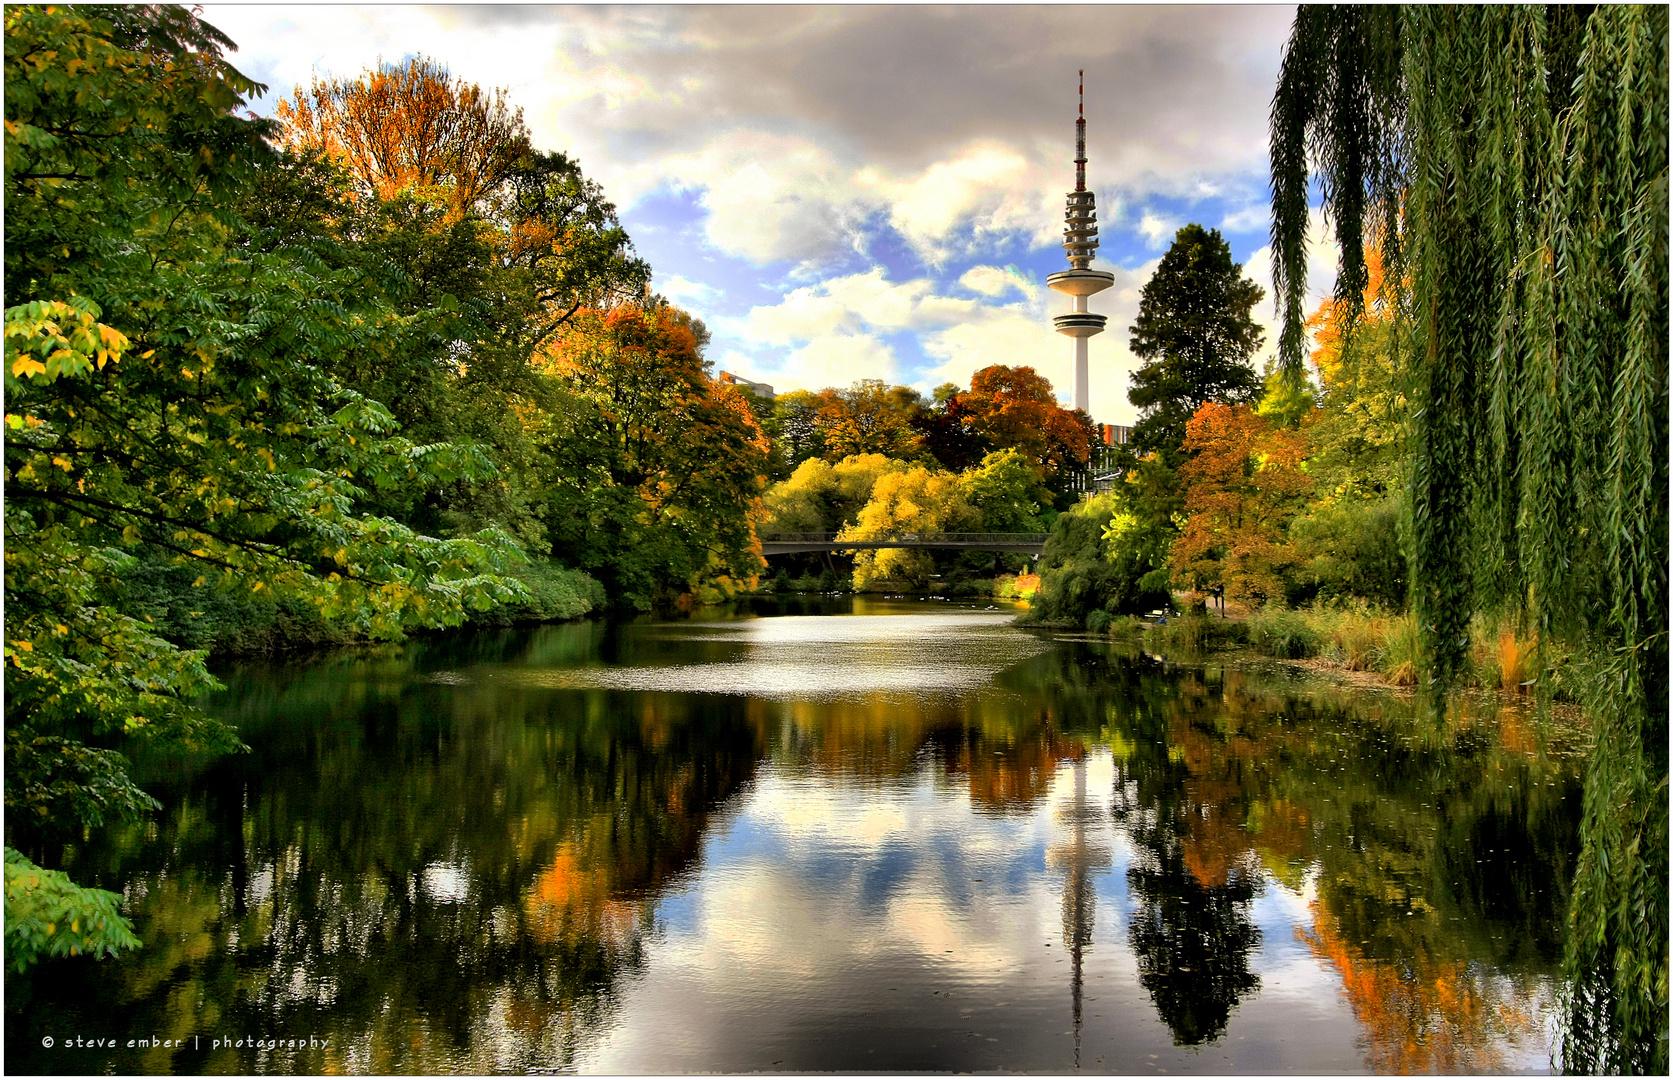 Planten un Blomen - A Hamburg Autumn Impression